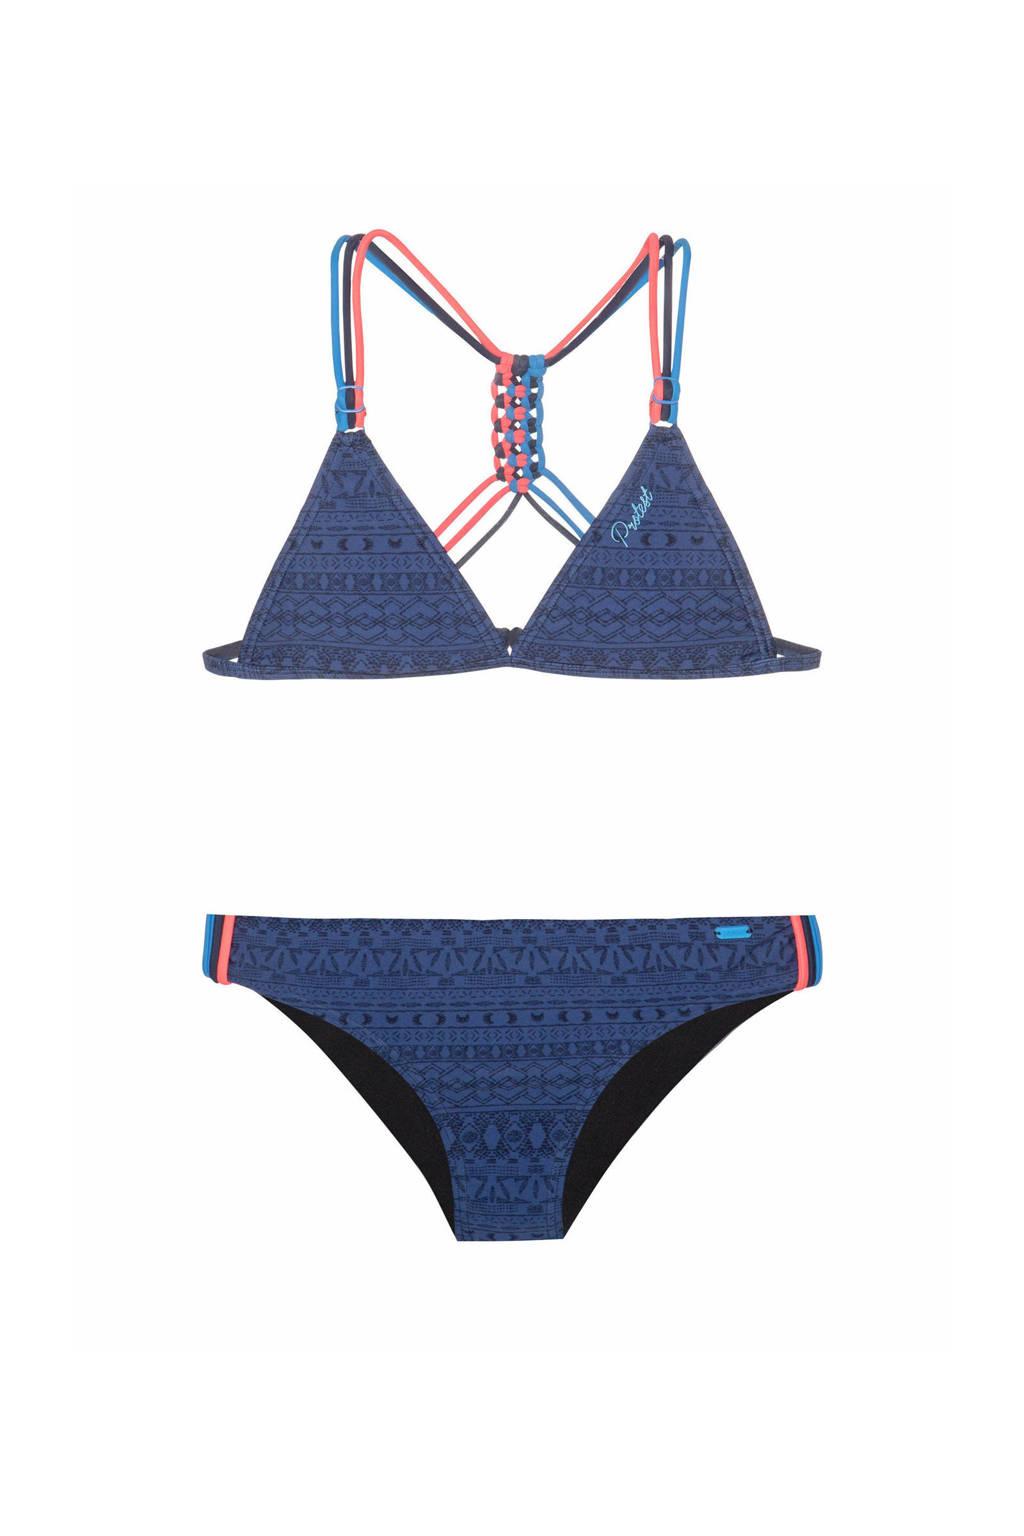 Protest triangel bikini Fimke met all over print donkeblauw, Ground Blue